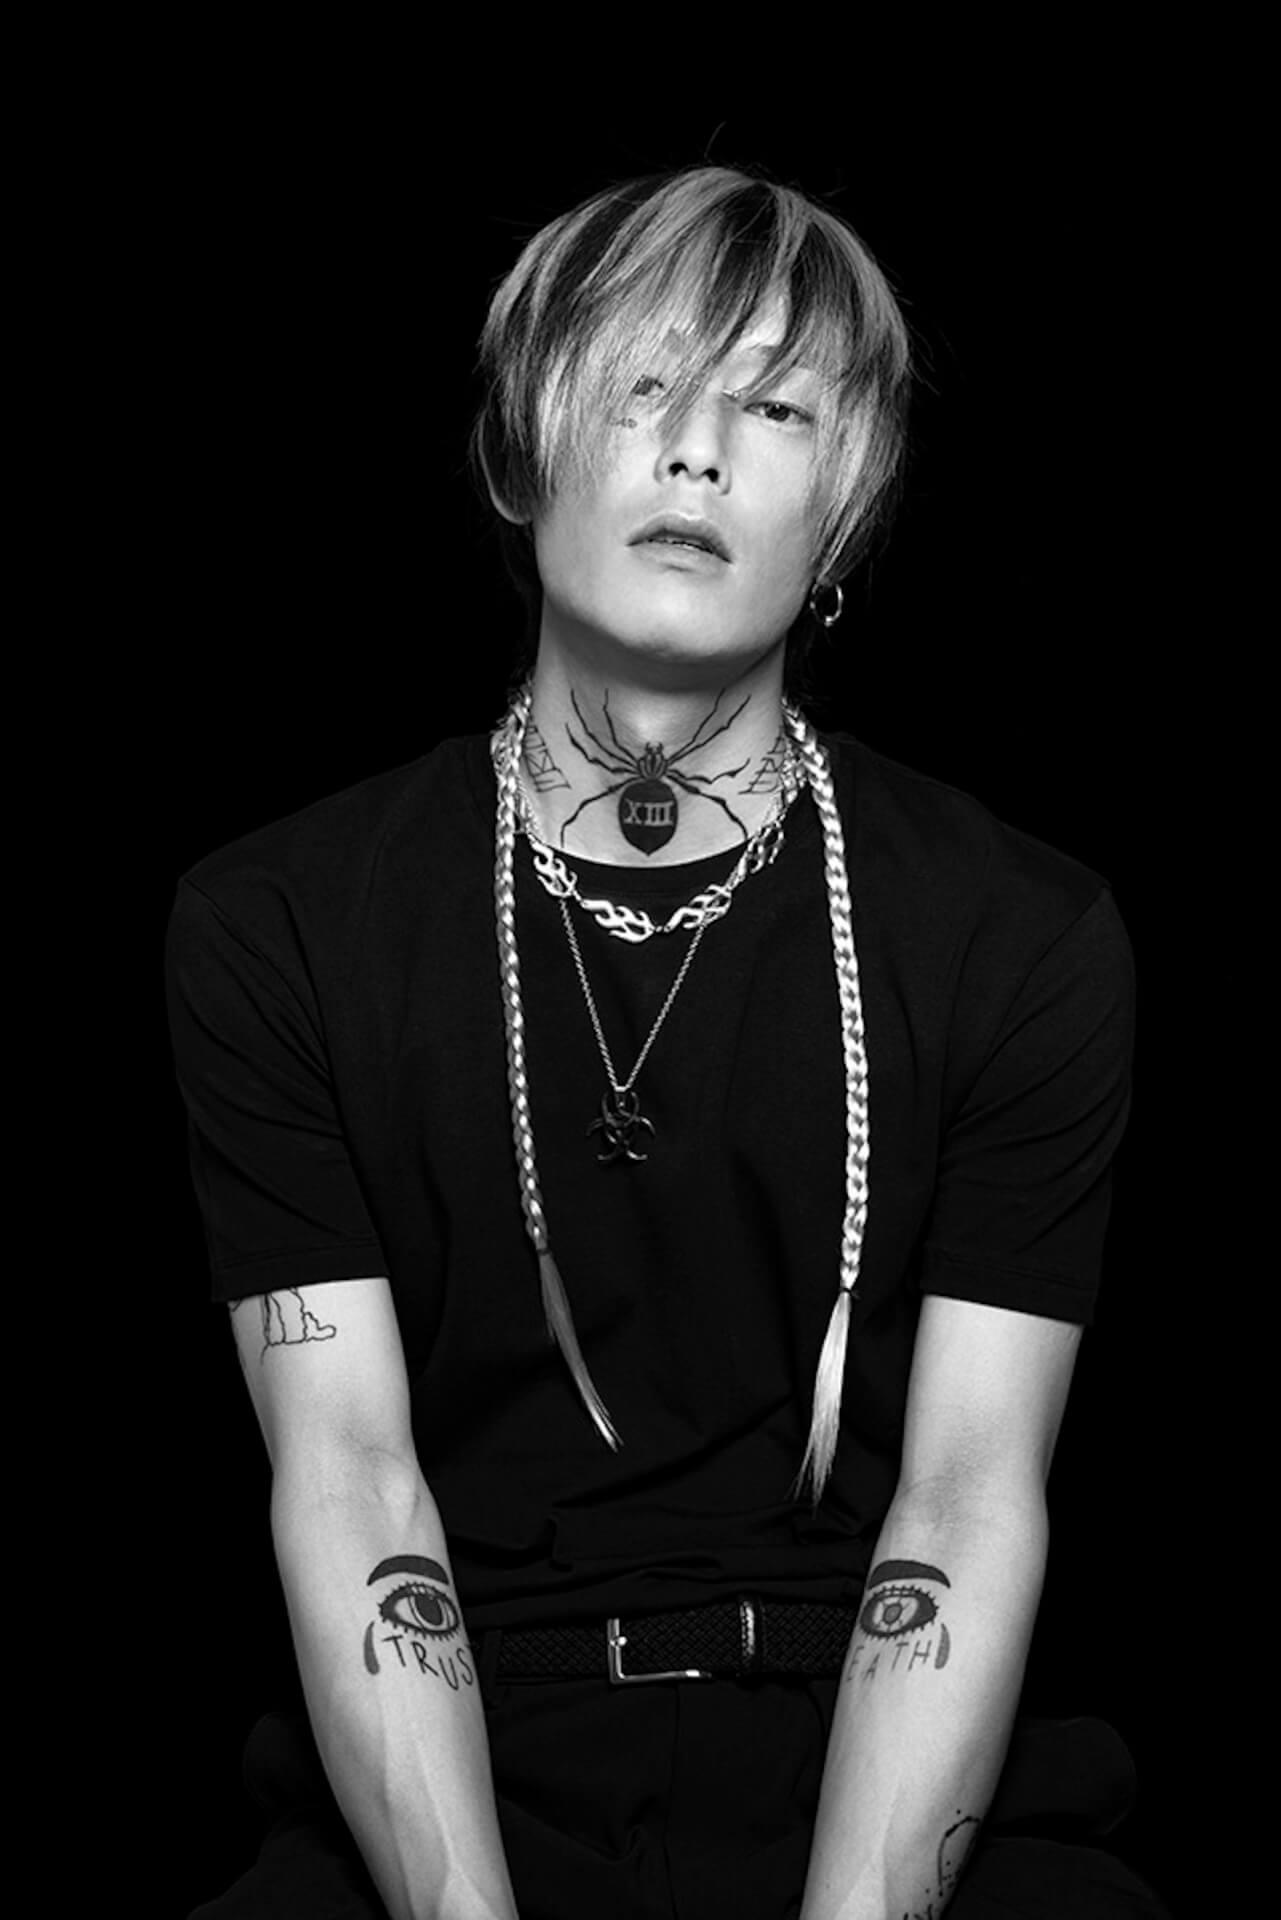 Jin Doggの最新アルバムツアー<SAD MAD TOUR 2020>東京公演が7月開催に延期 music200408_jindogg_5